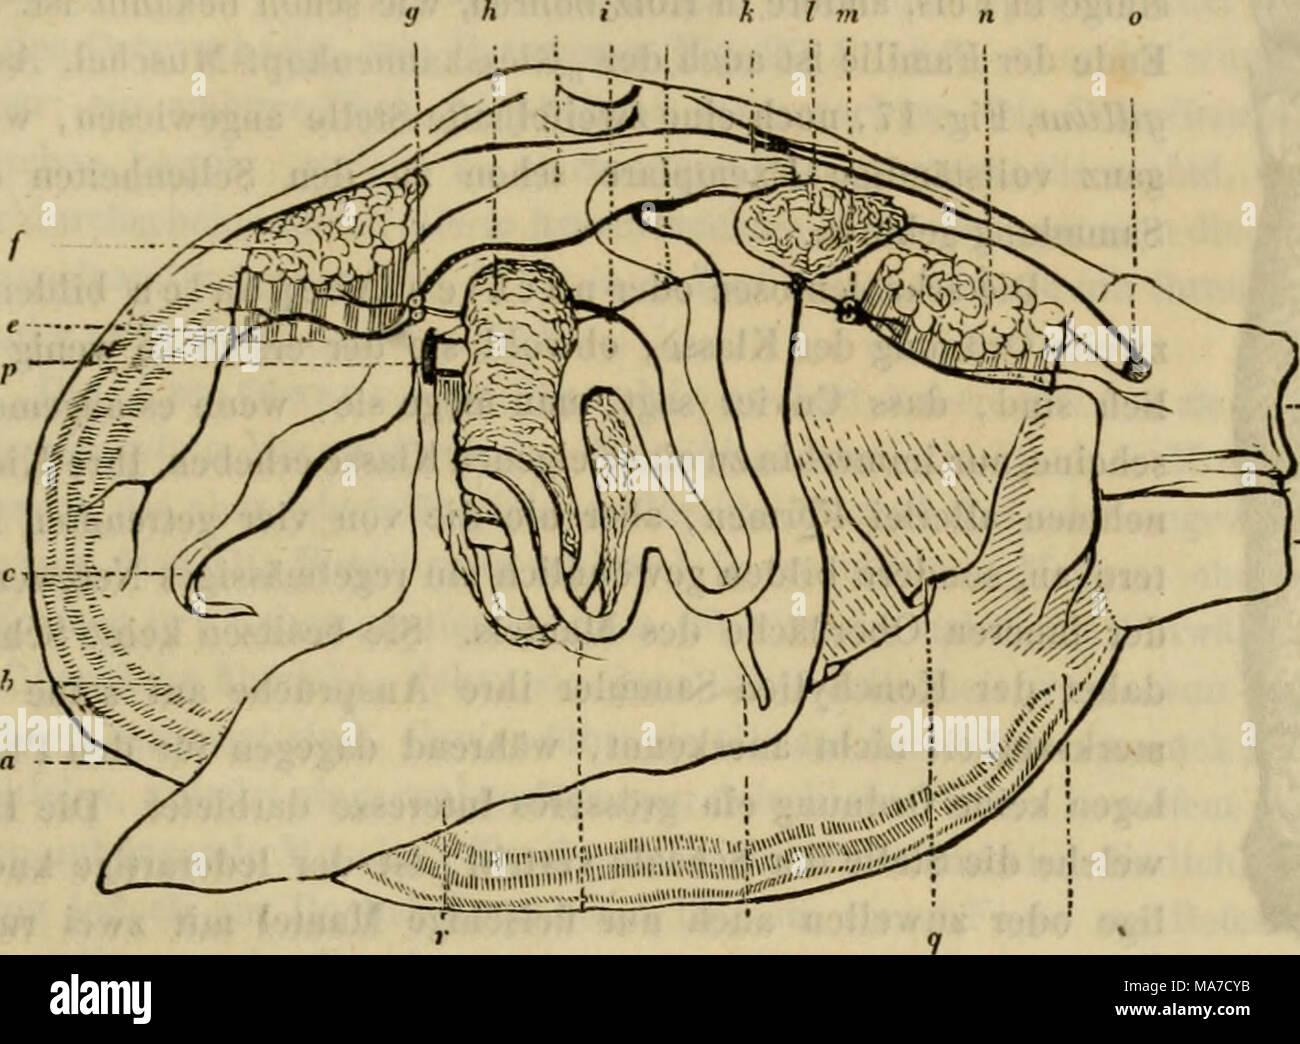 Genital H Stockfotos & Genital H Bilder - Alamy